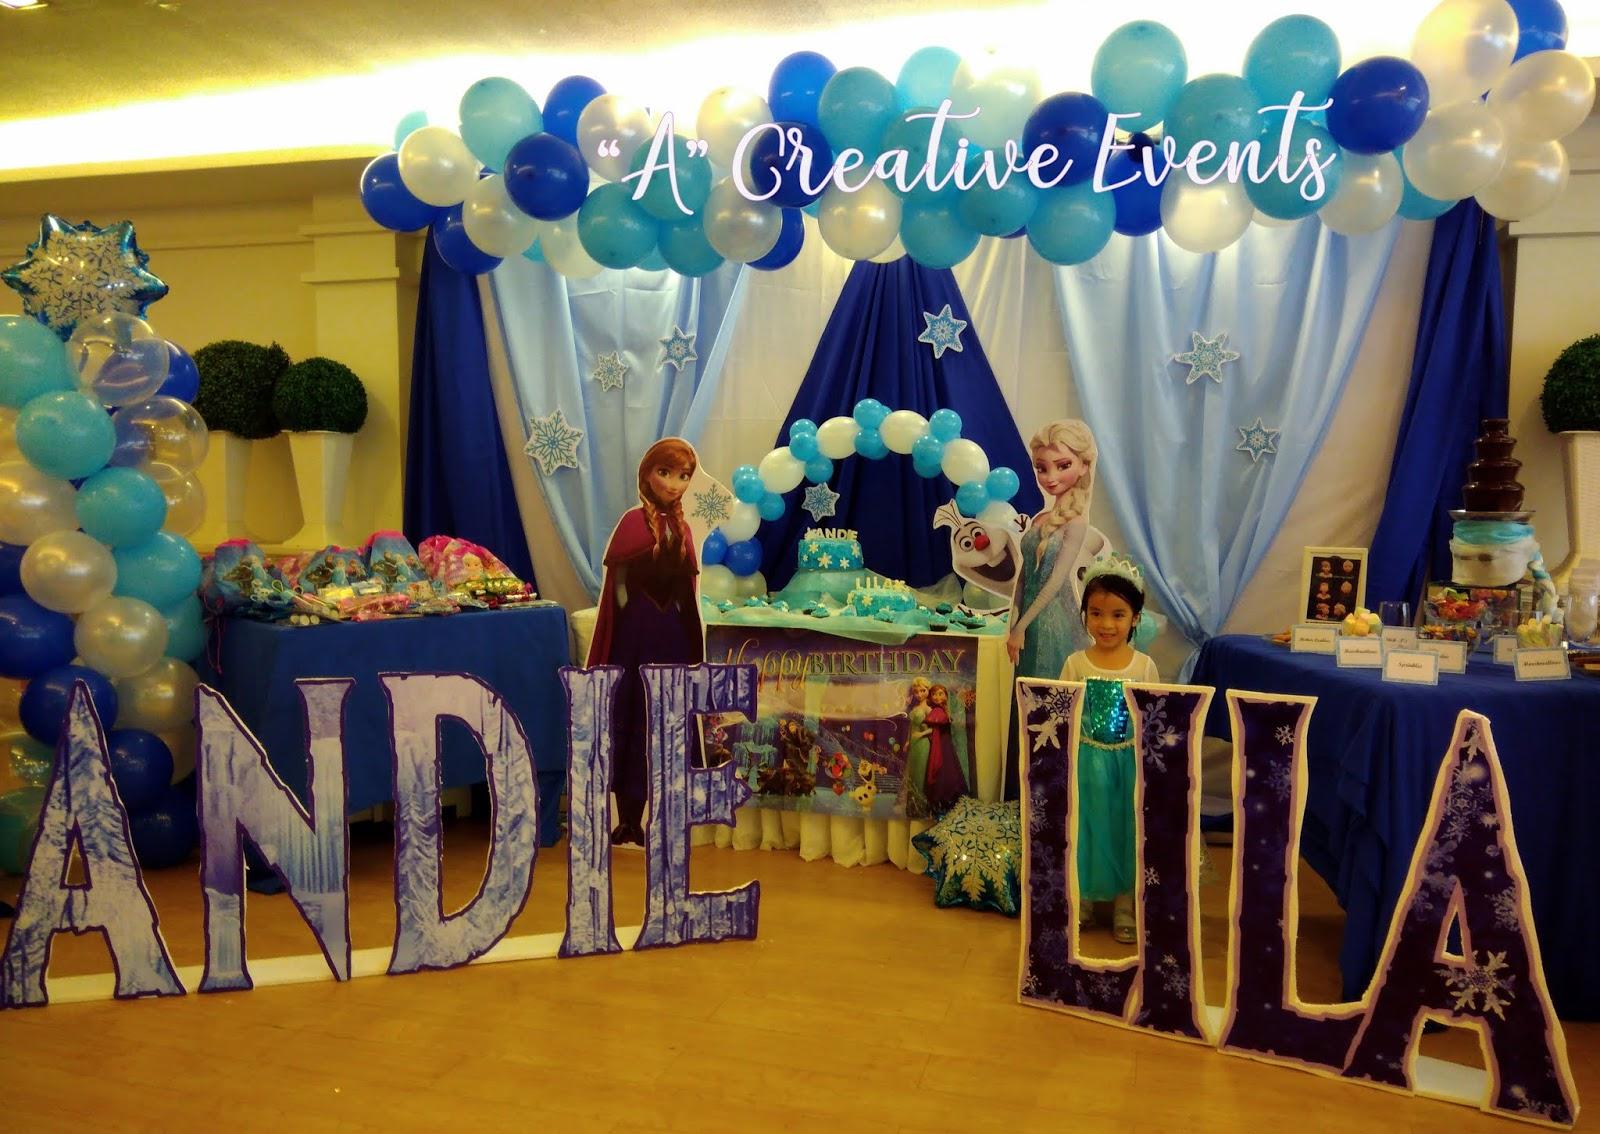 Birthday Celebrant in Elsa Costume - Frozen Themed Party